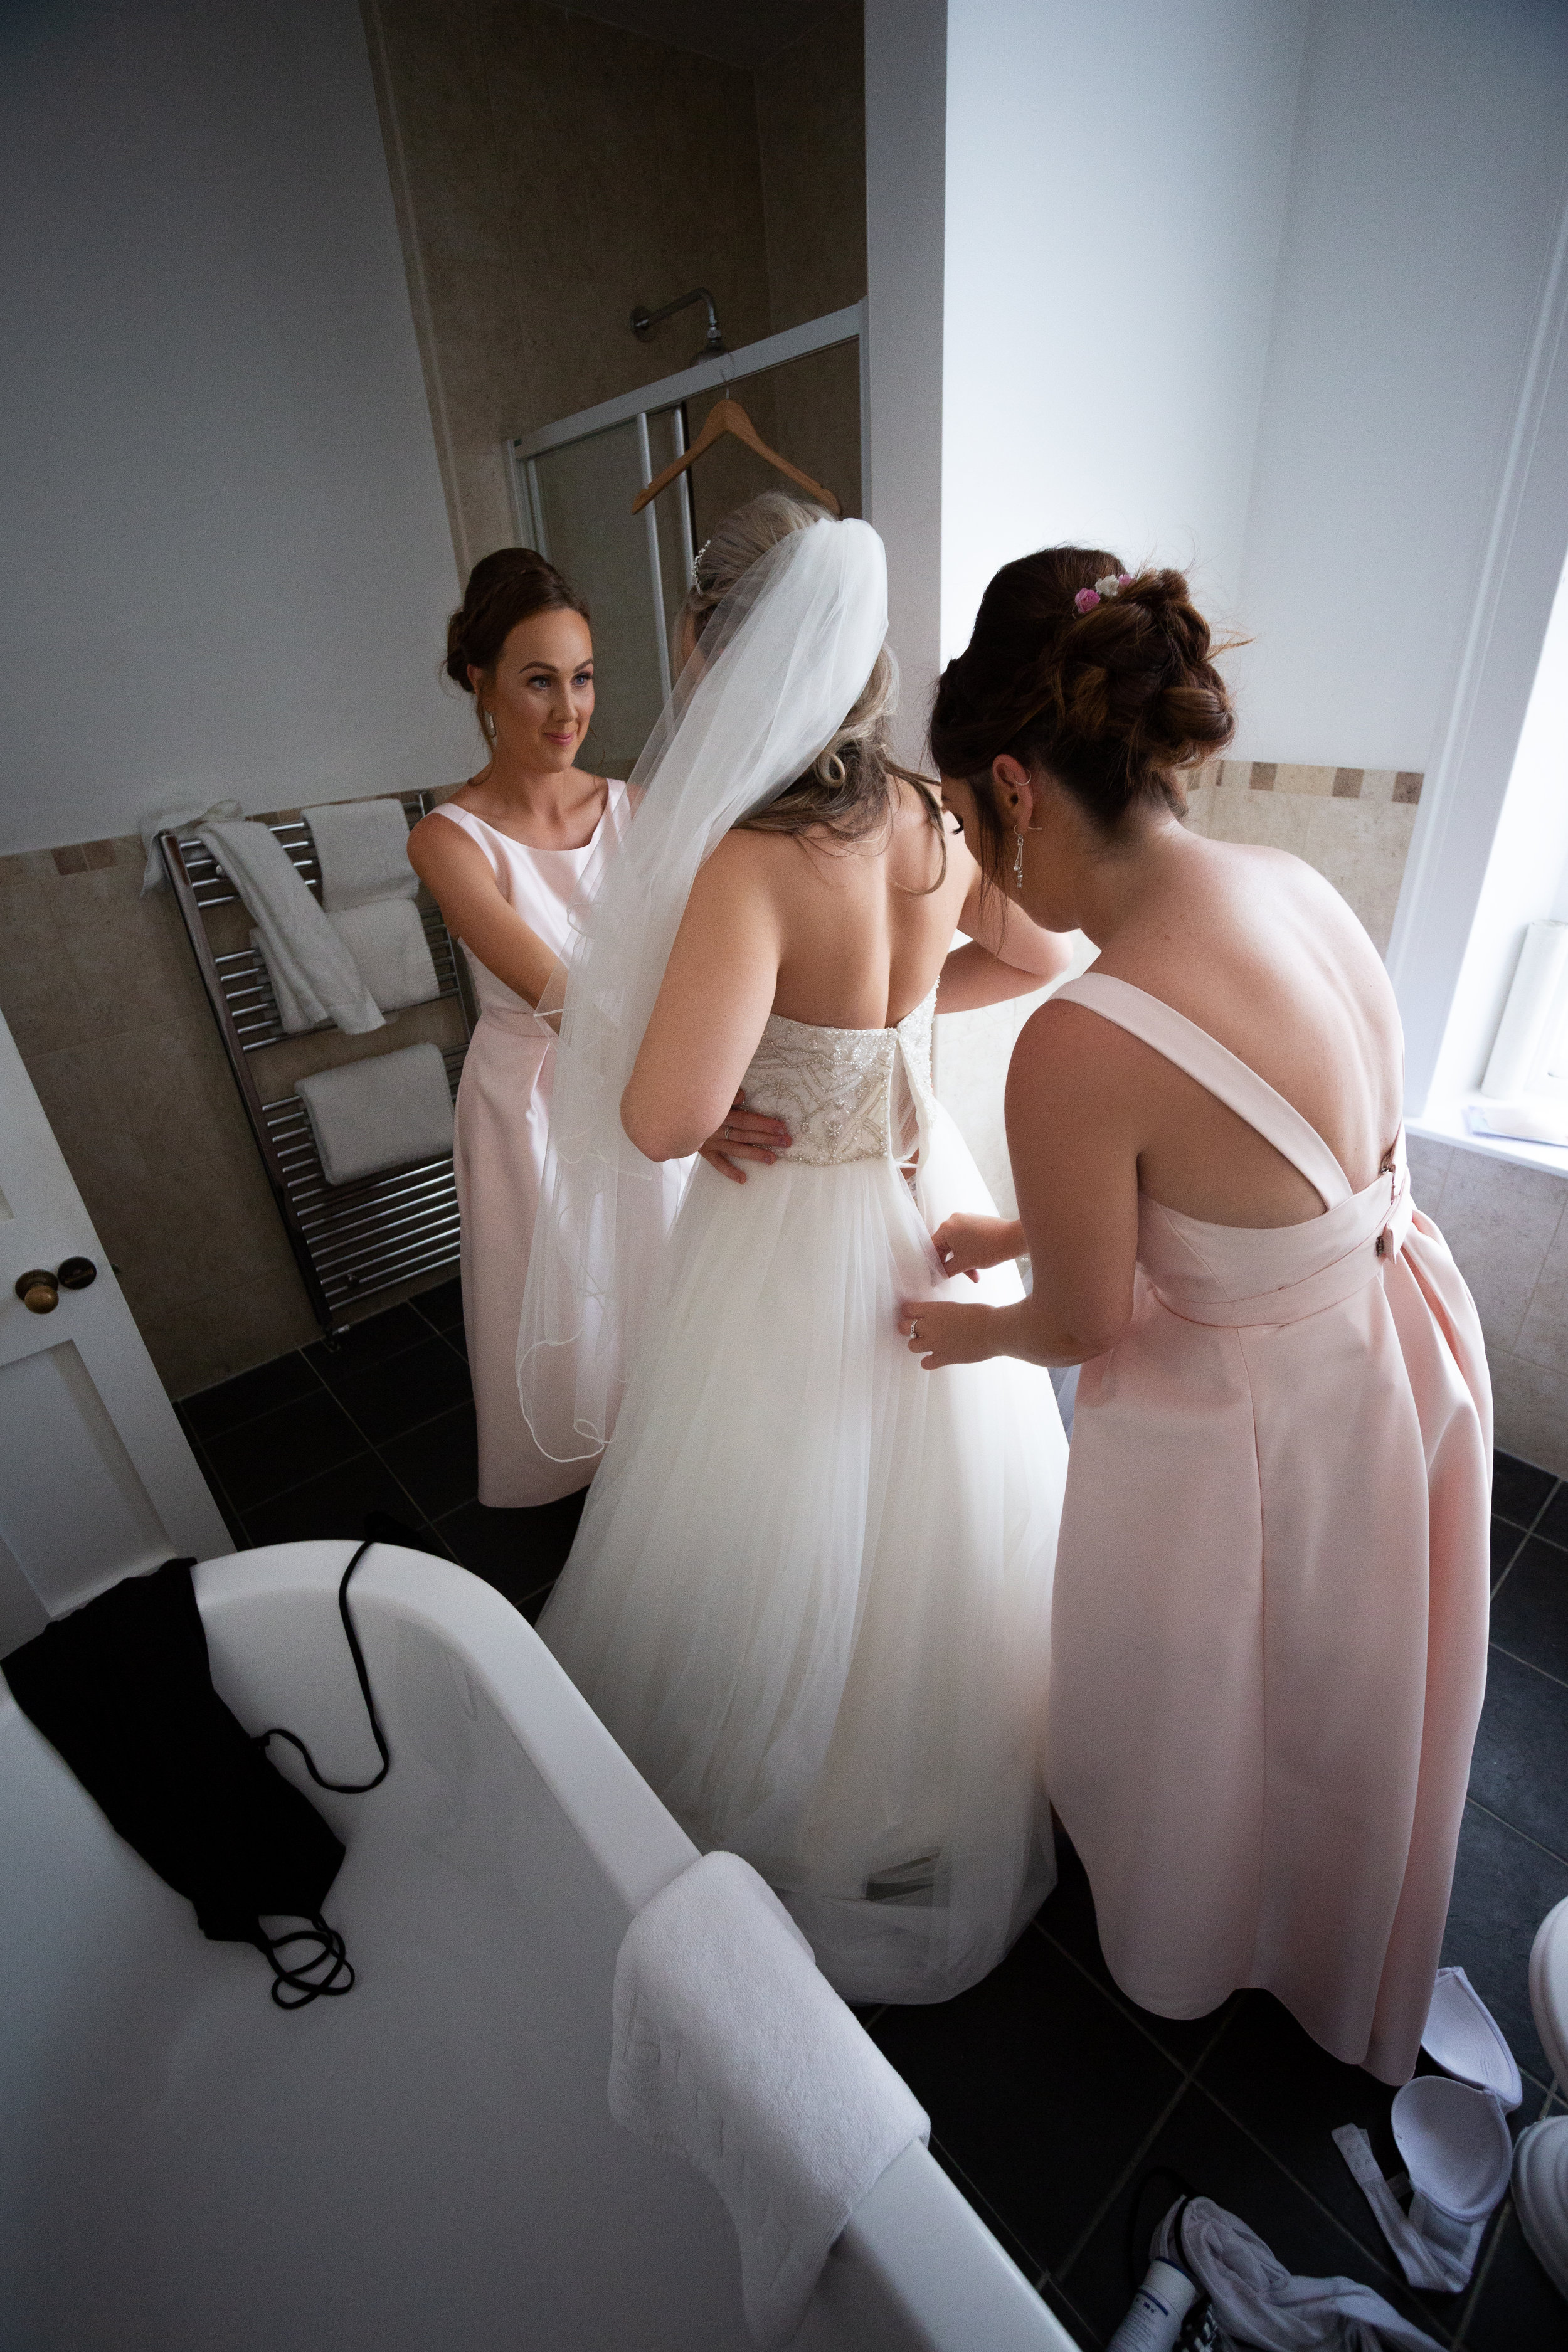 wedding-lea-cooper-photography-willenhall-west-midlands-wolverhampton-dudley-birmingham-uk-marriage-hadley-park-east-telford-wedding-dress.jpg